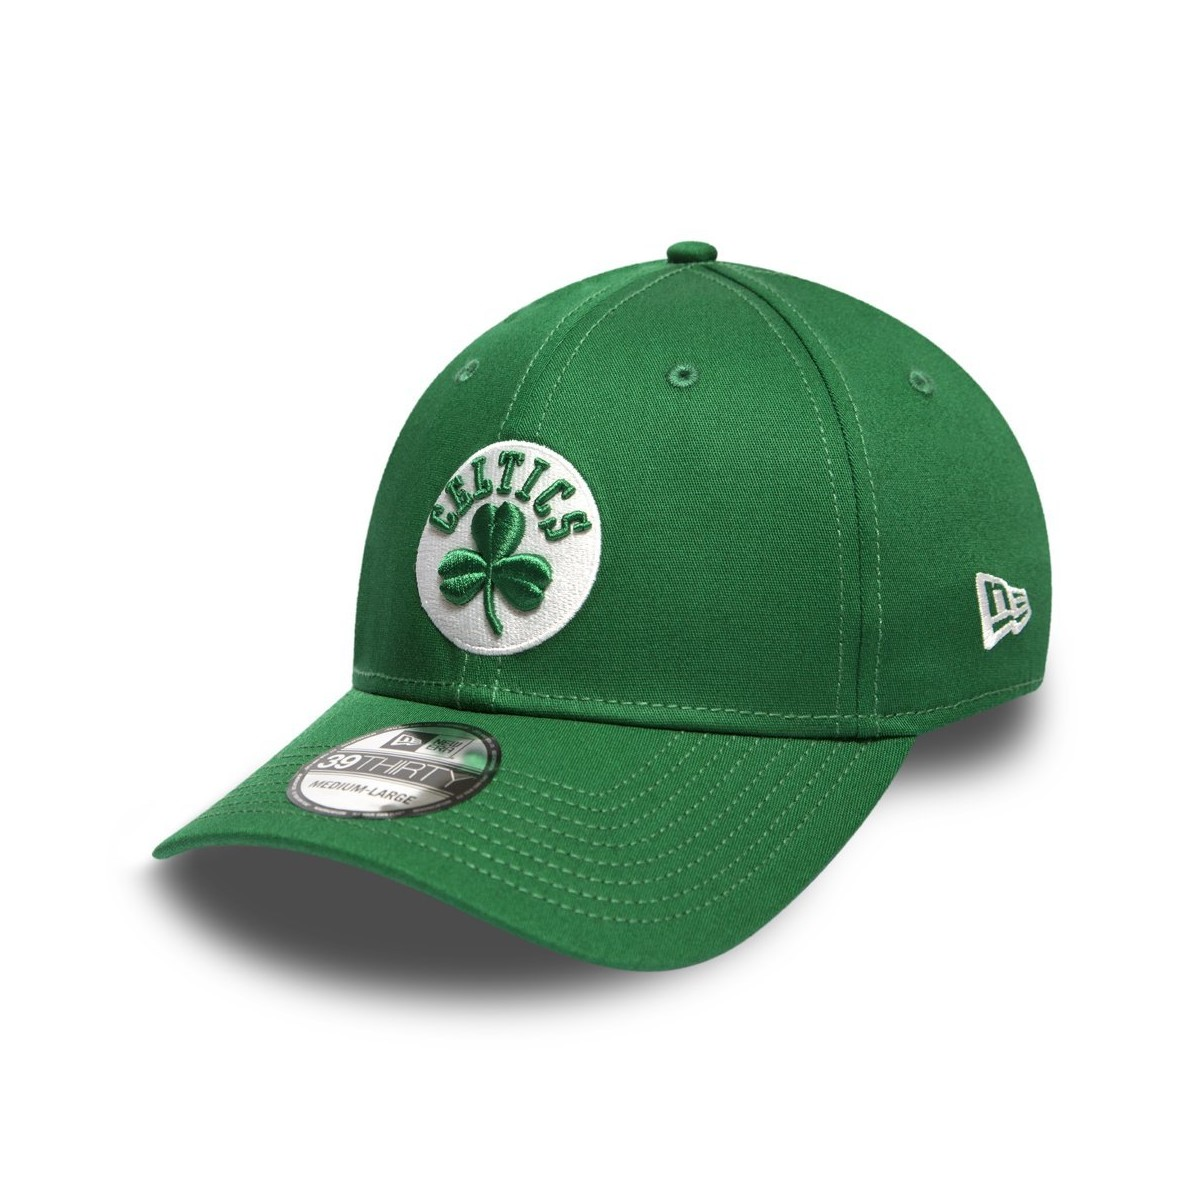 Cappello New Era 39thirty Nba Team Boston Celtics Basket